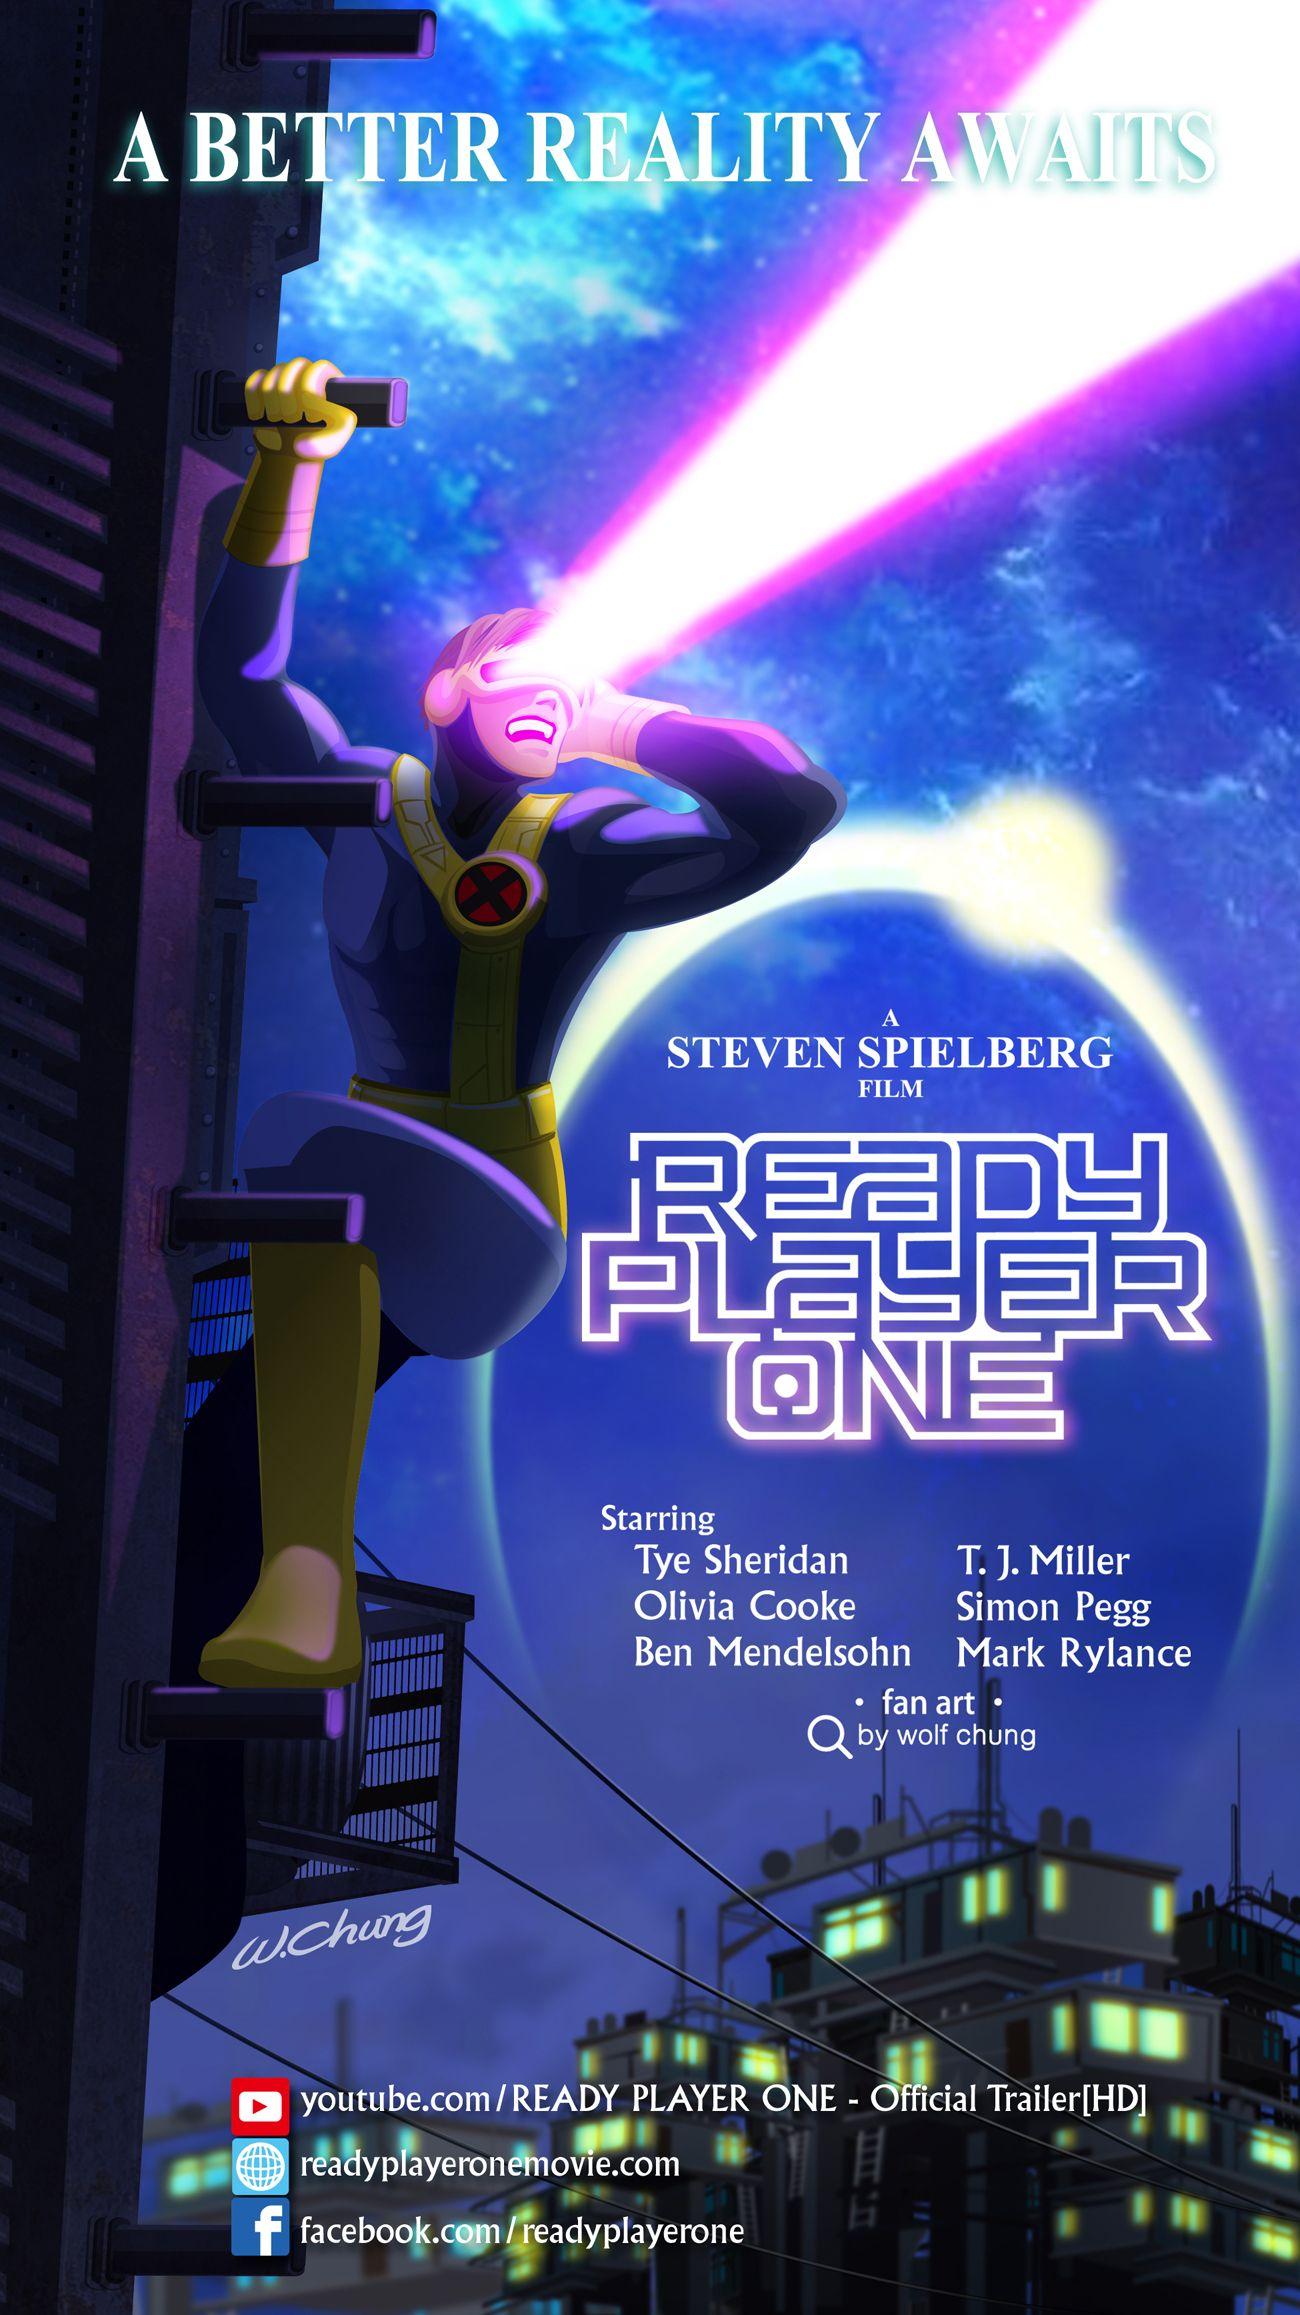 Ready Player One Ready Player One Movie Poster Steven Spielberg Tye Sheridan X Men X Men Cyclops Cyclops Mar Ready Player One Player One Ready Player One Movie